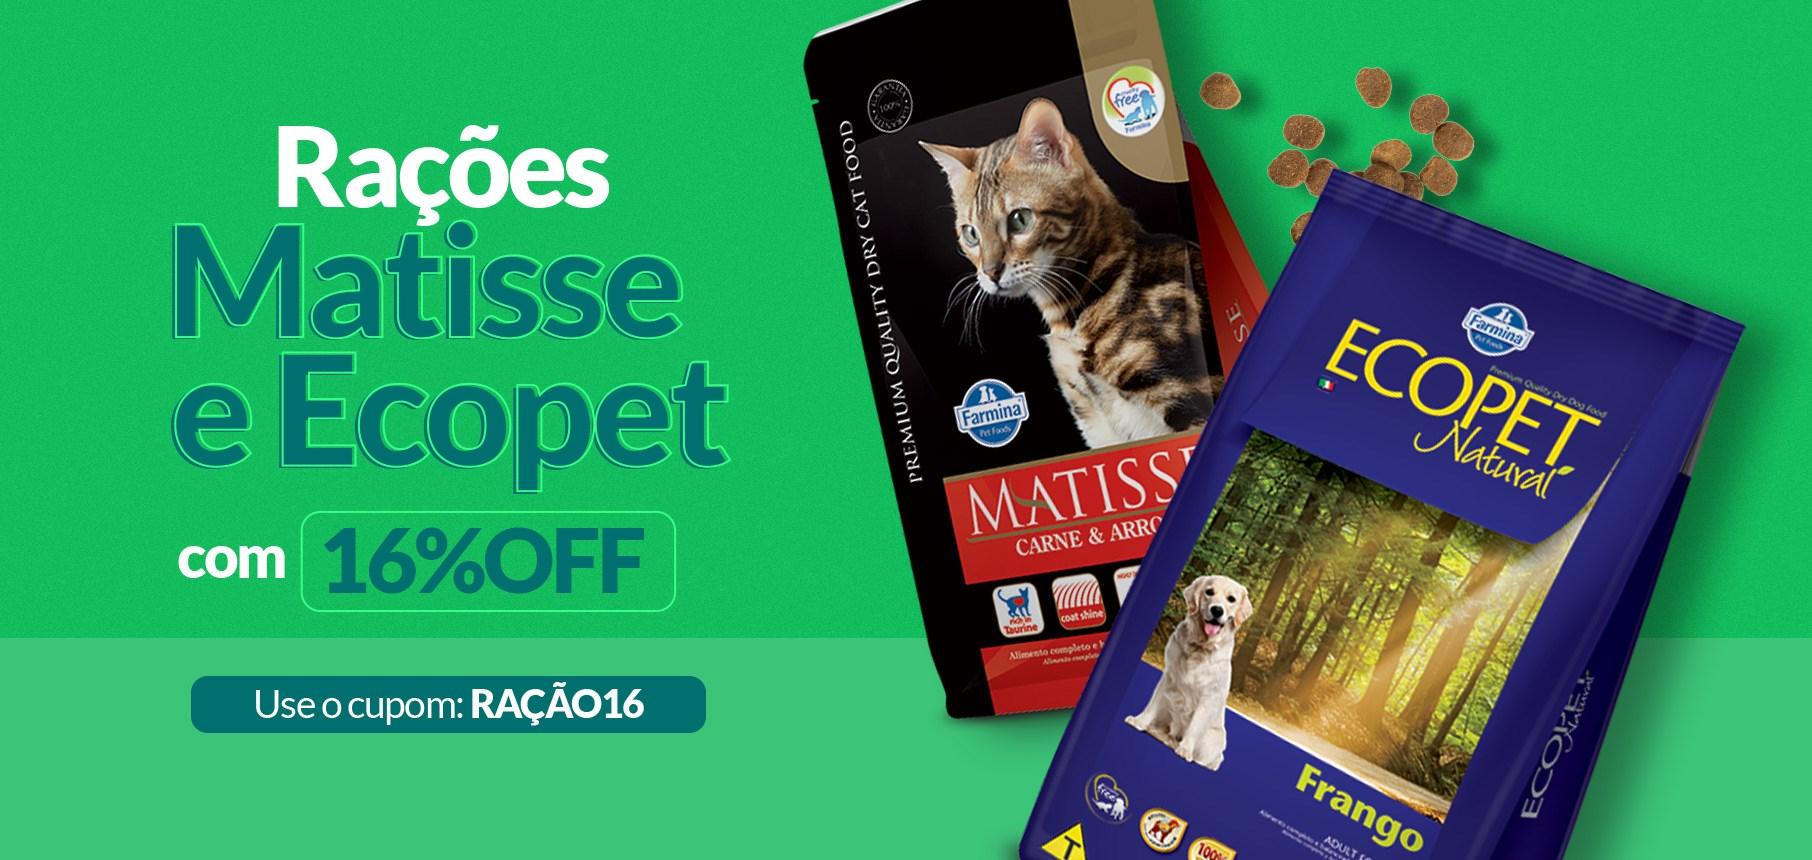 16%OFF em Matisse e Ecopet